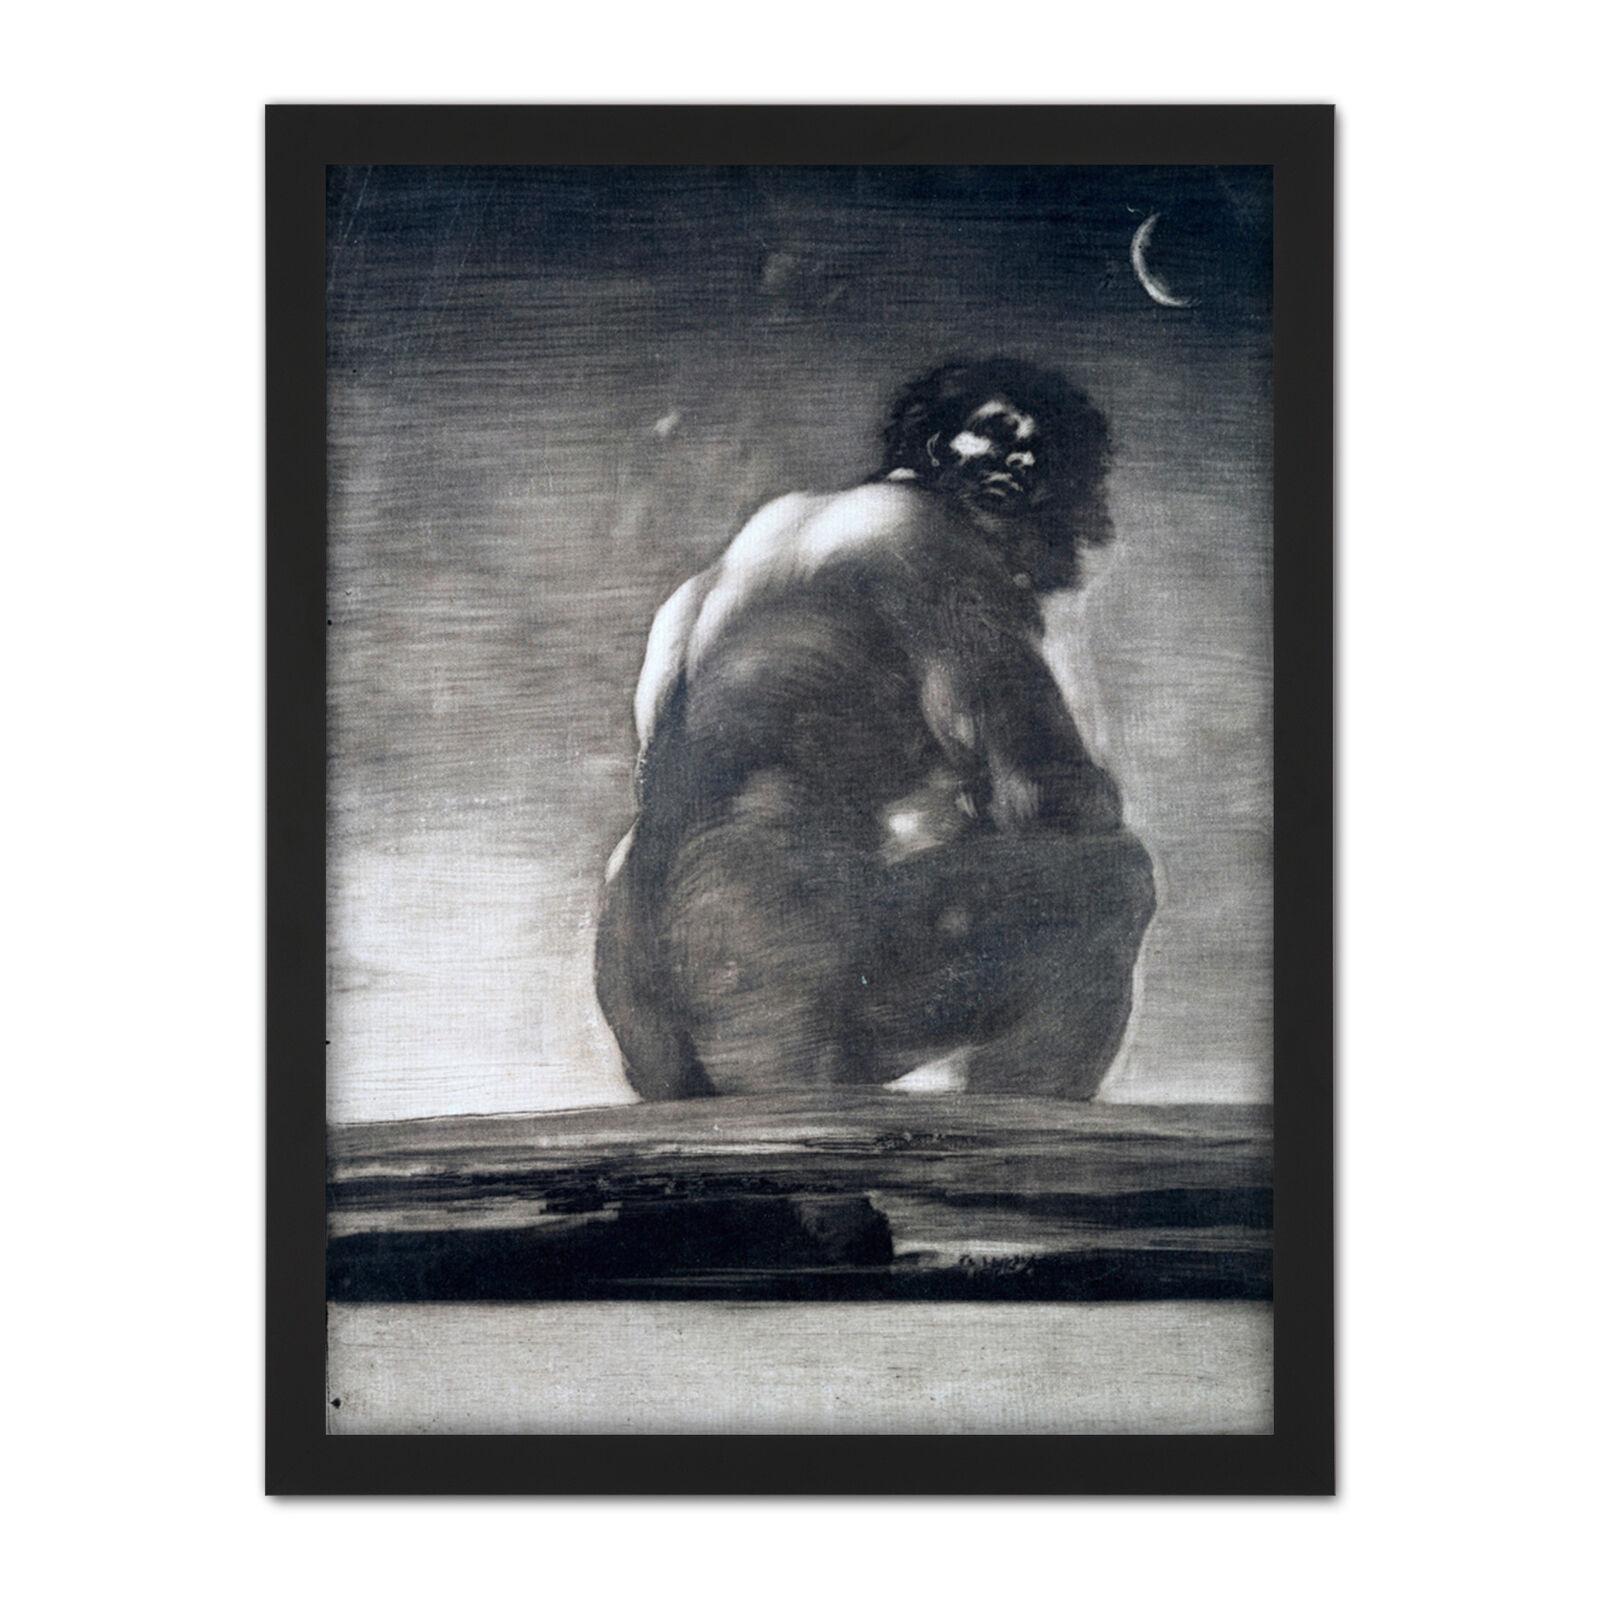 Francisco Goya Y Lucientes Seated Giant Large Framed Art Print